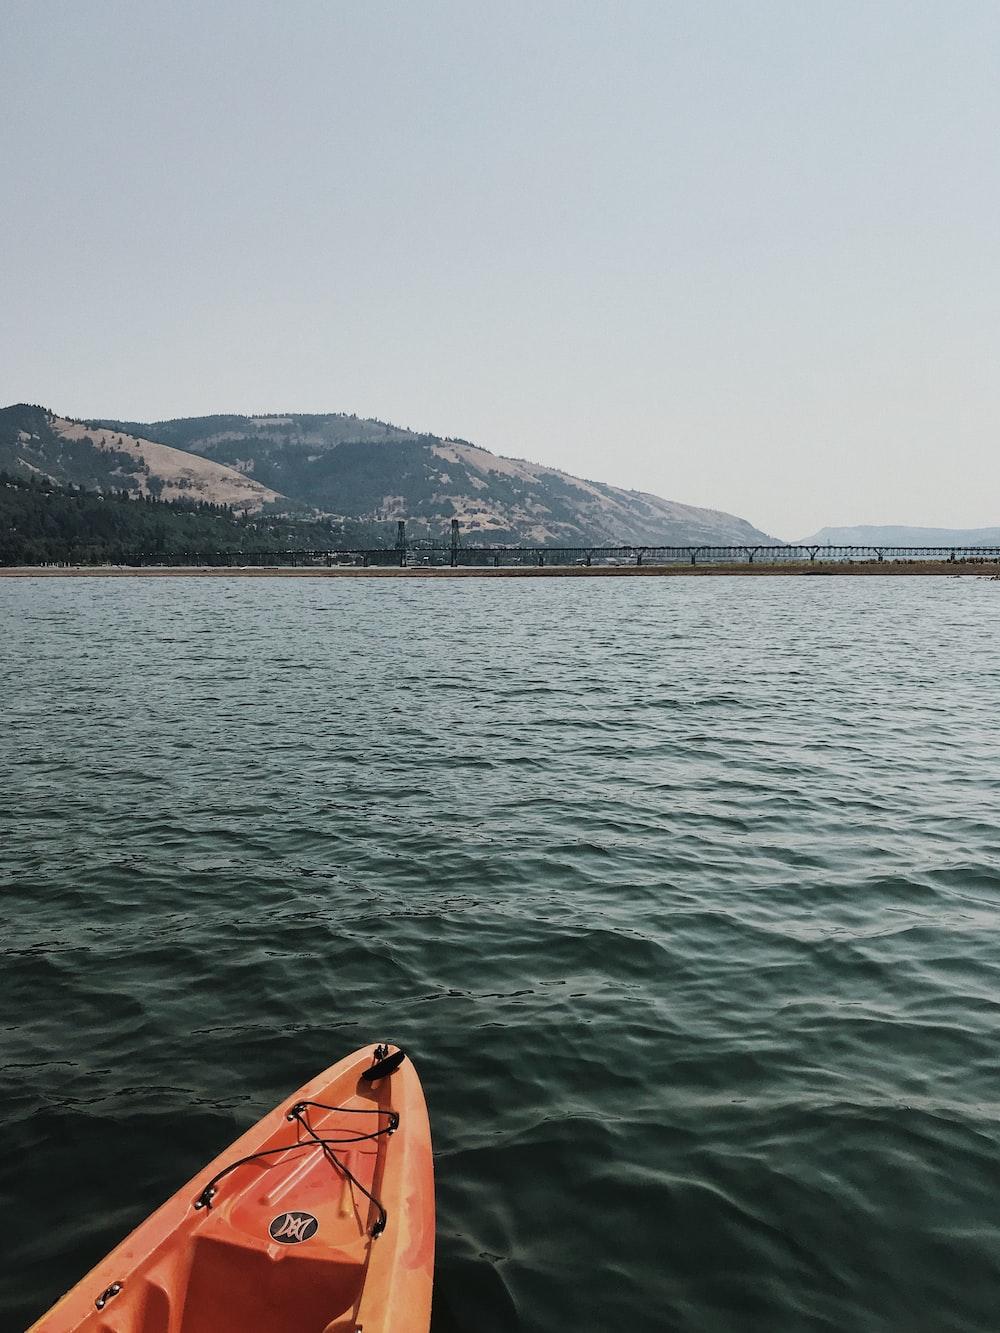 orange boat on body of water